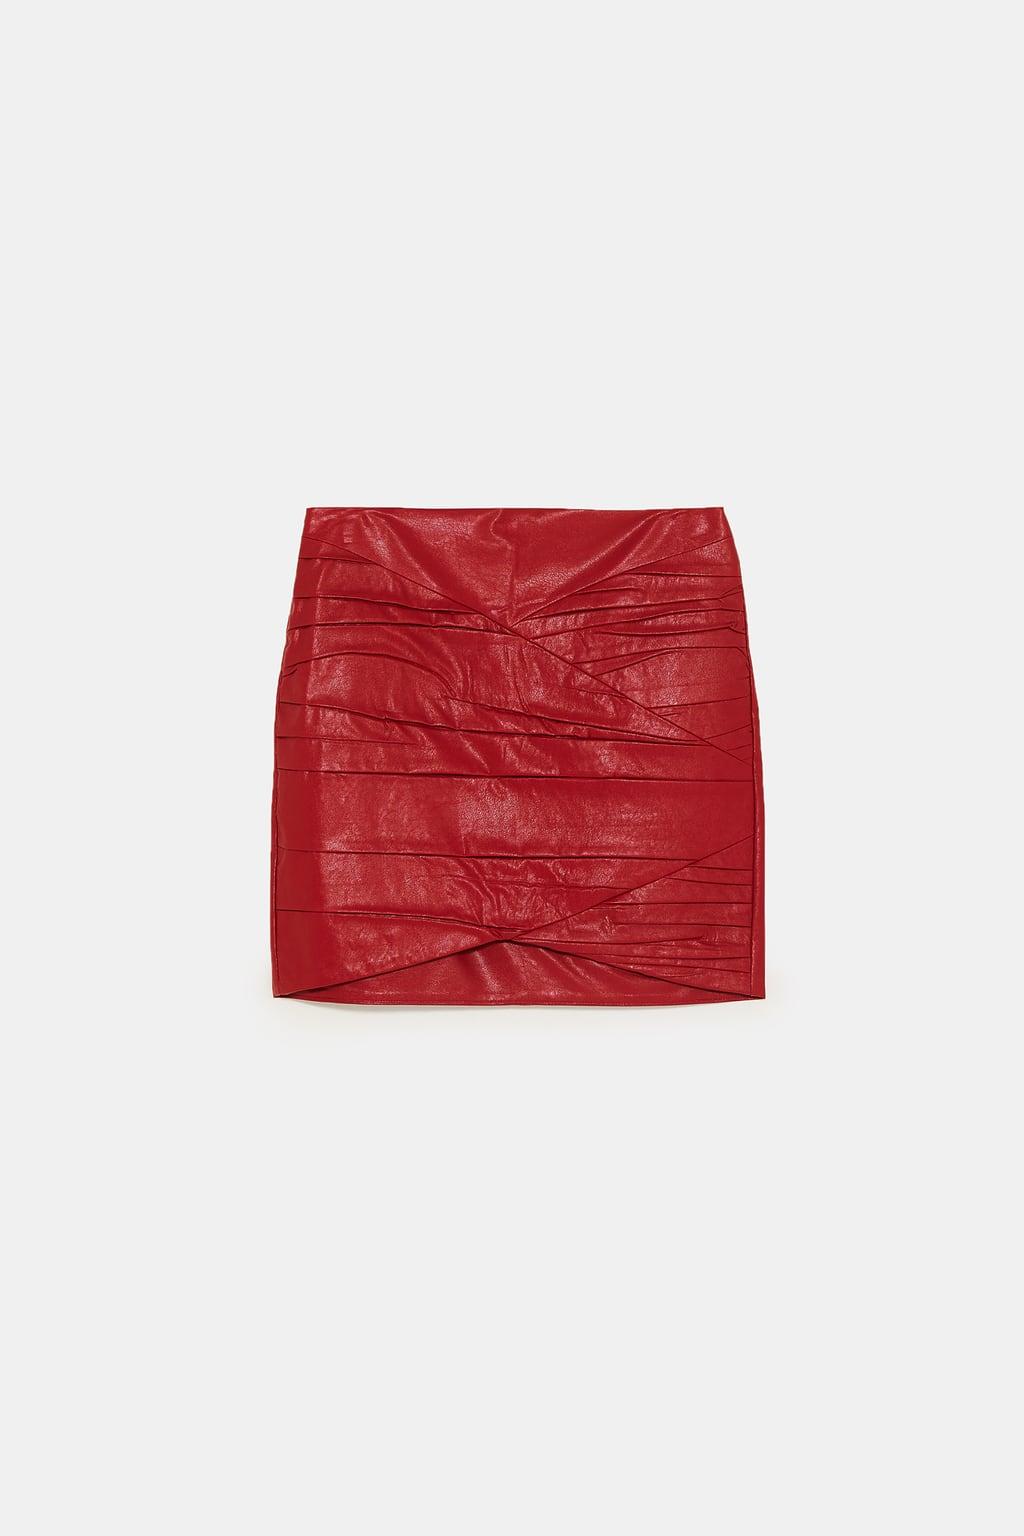 zara - gathered faux leather mini skirt